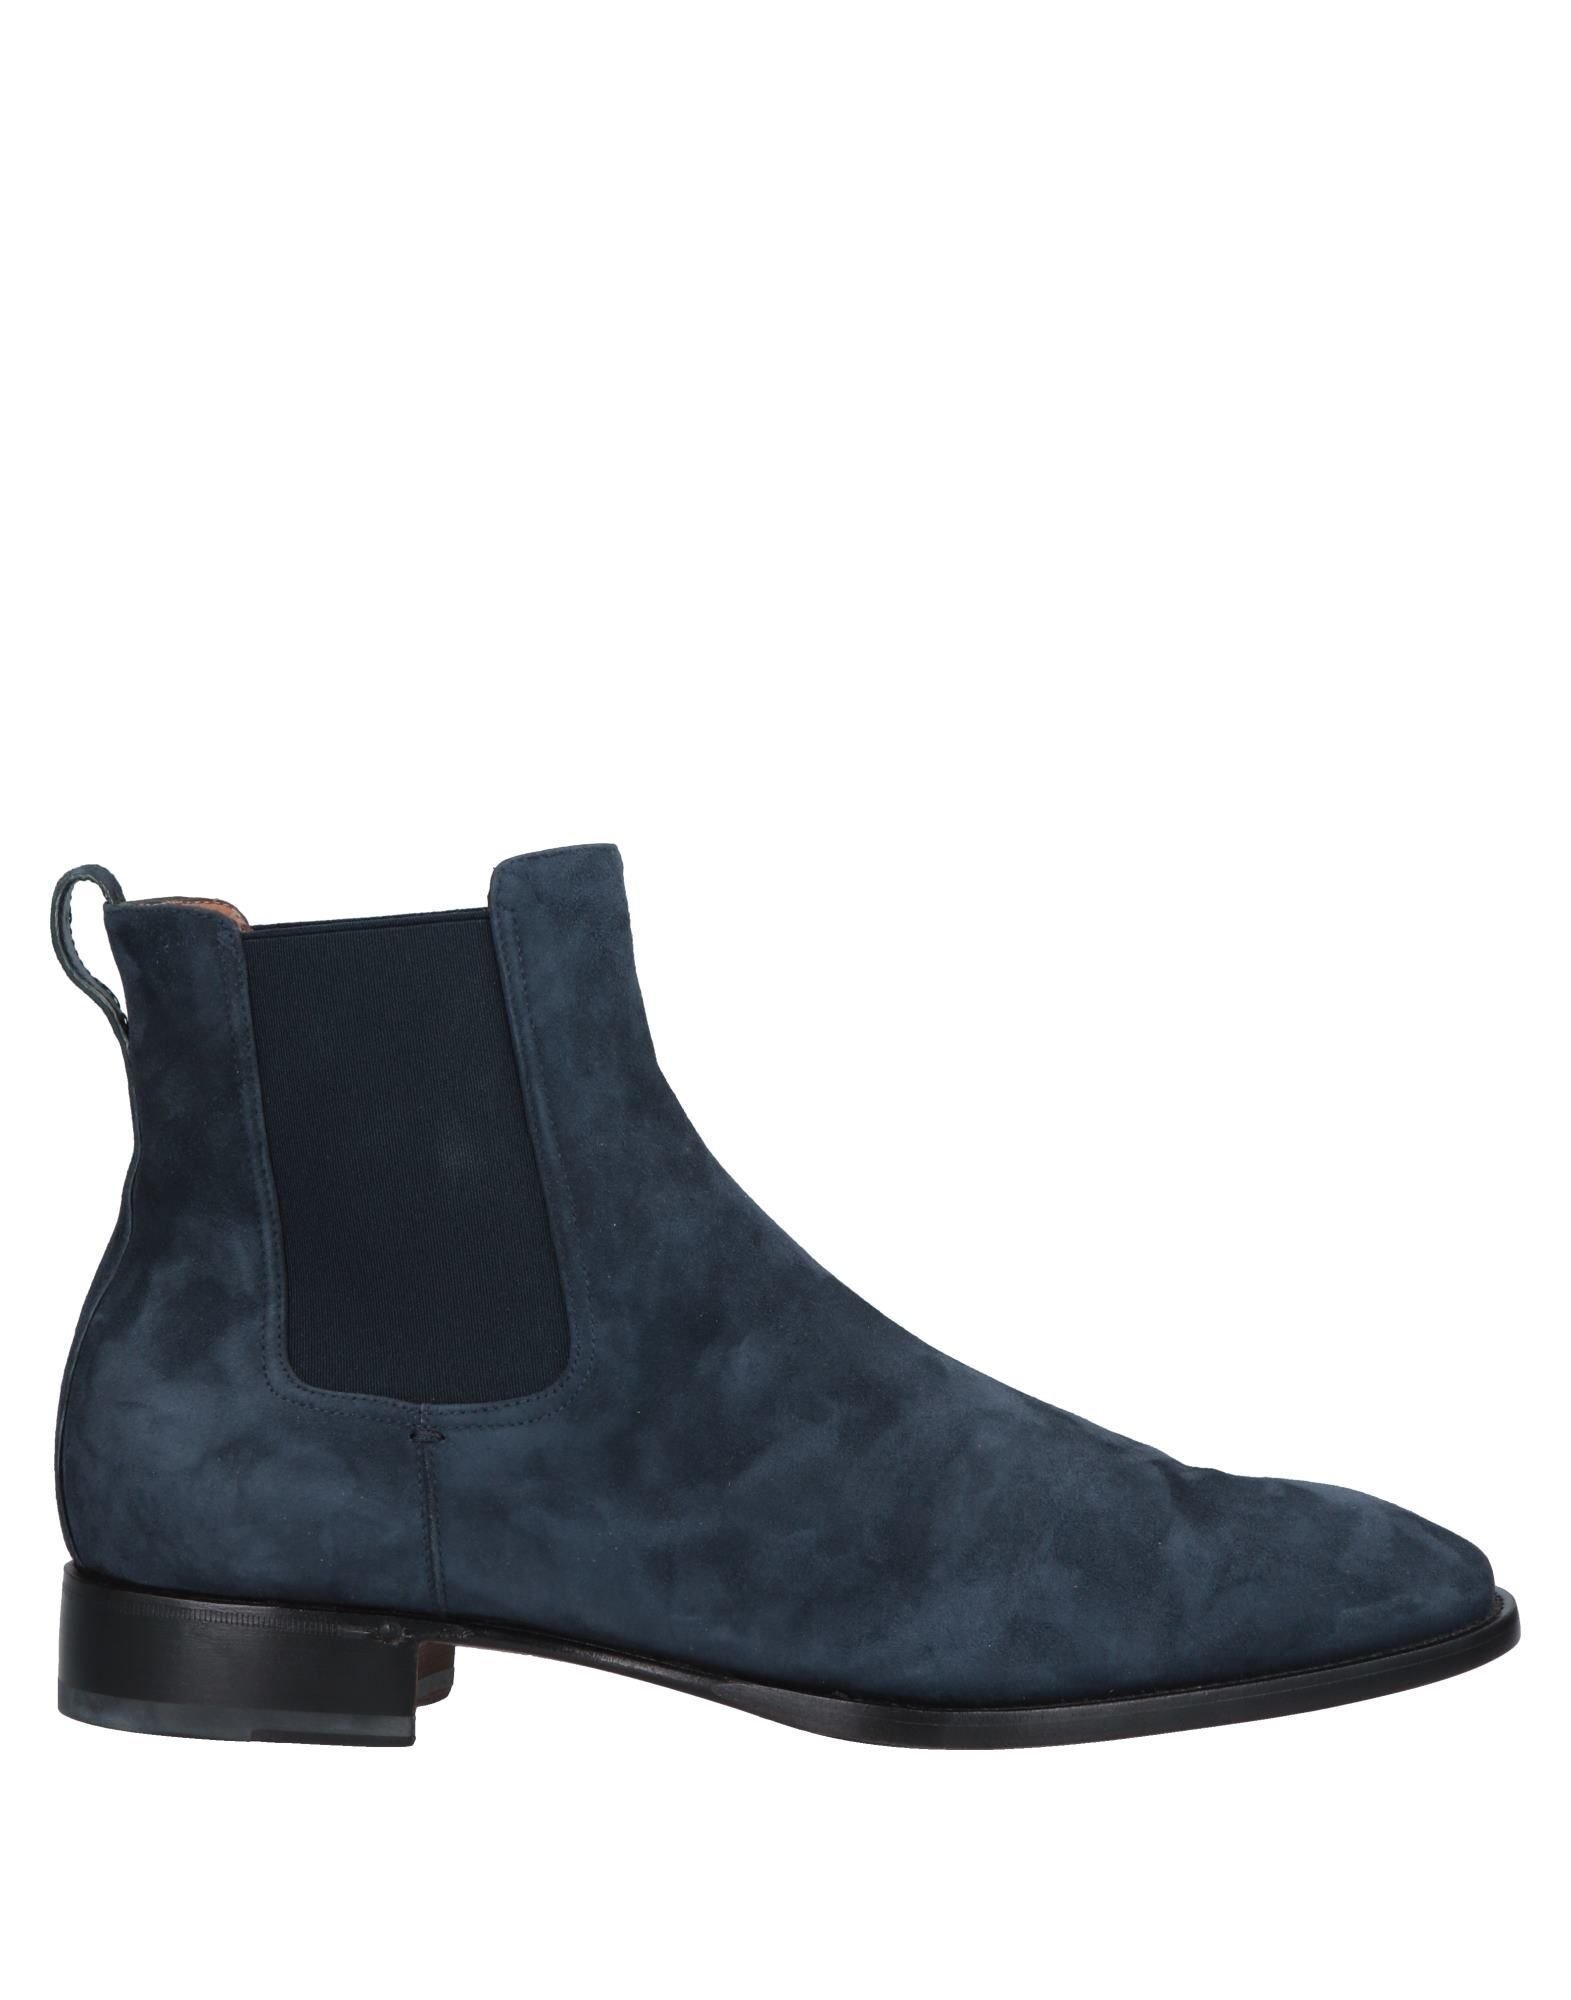 SILVANO SASSETTI Полусапоги и высокие ботинки silvano sassetti полусапоги и высокие ботинки